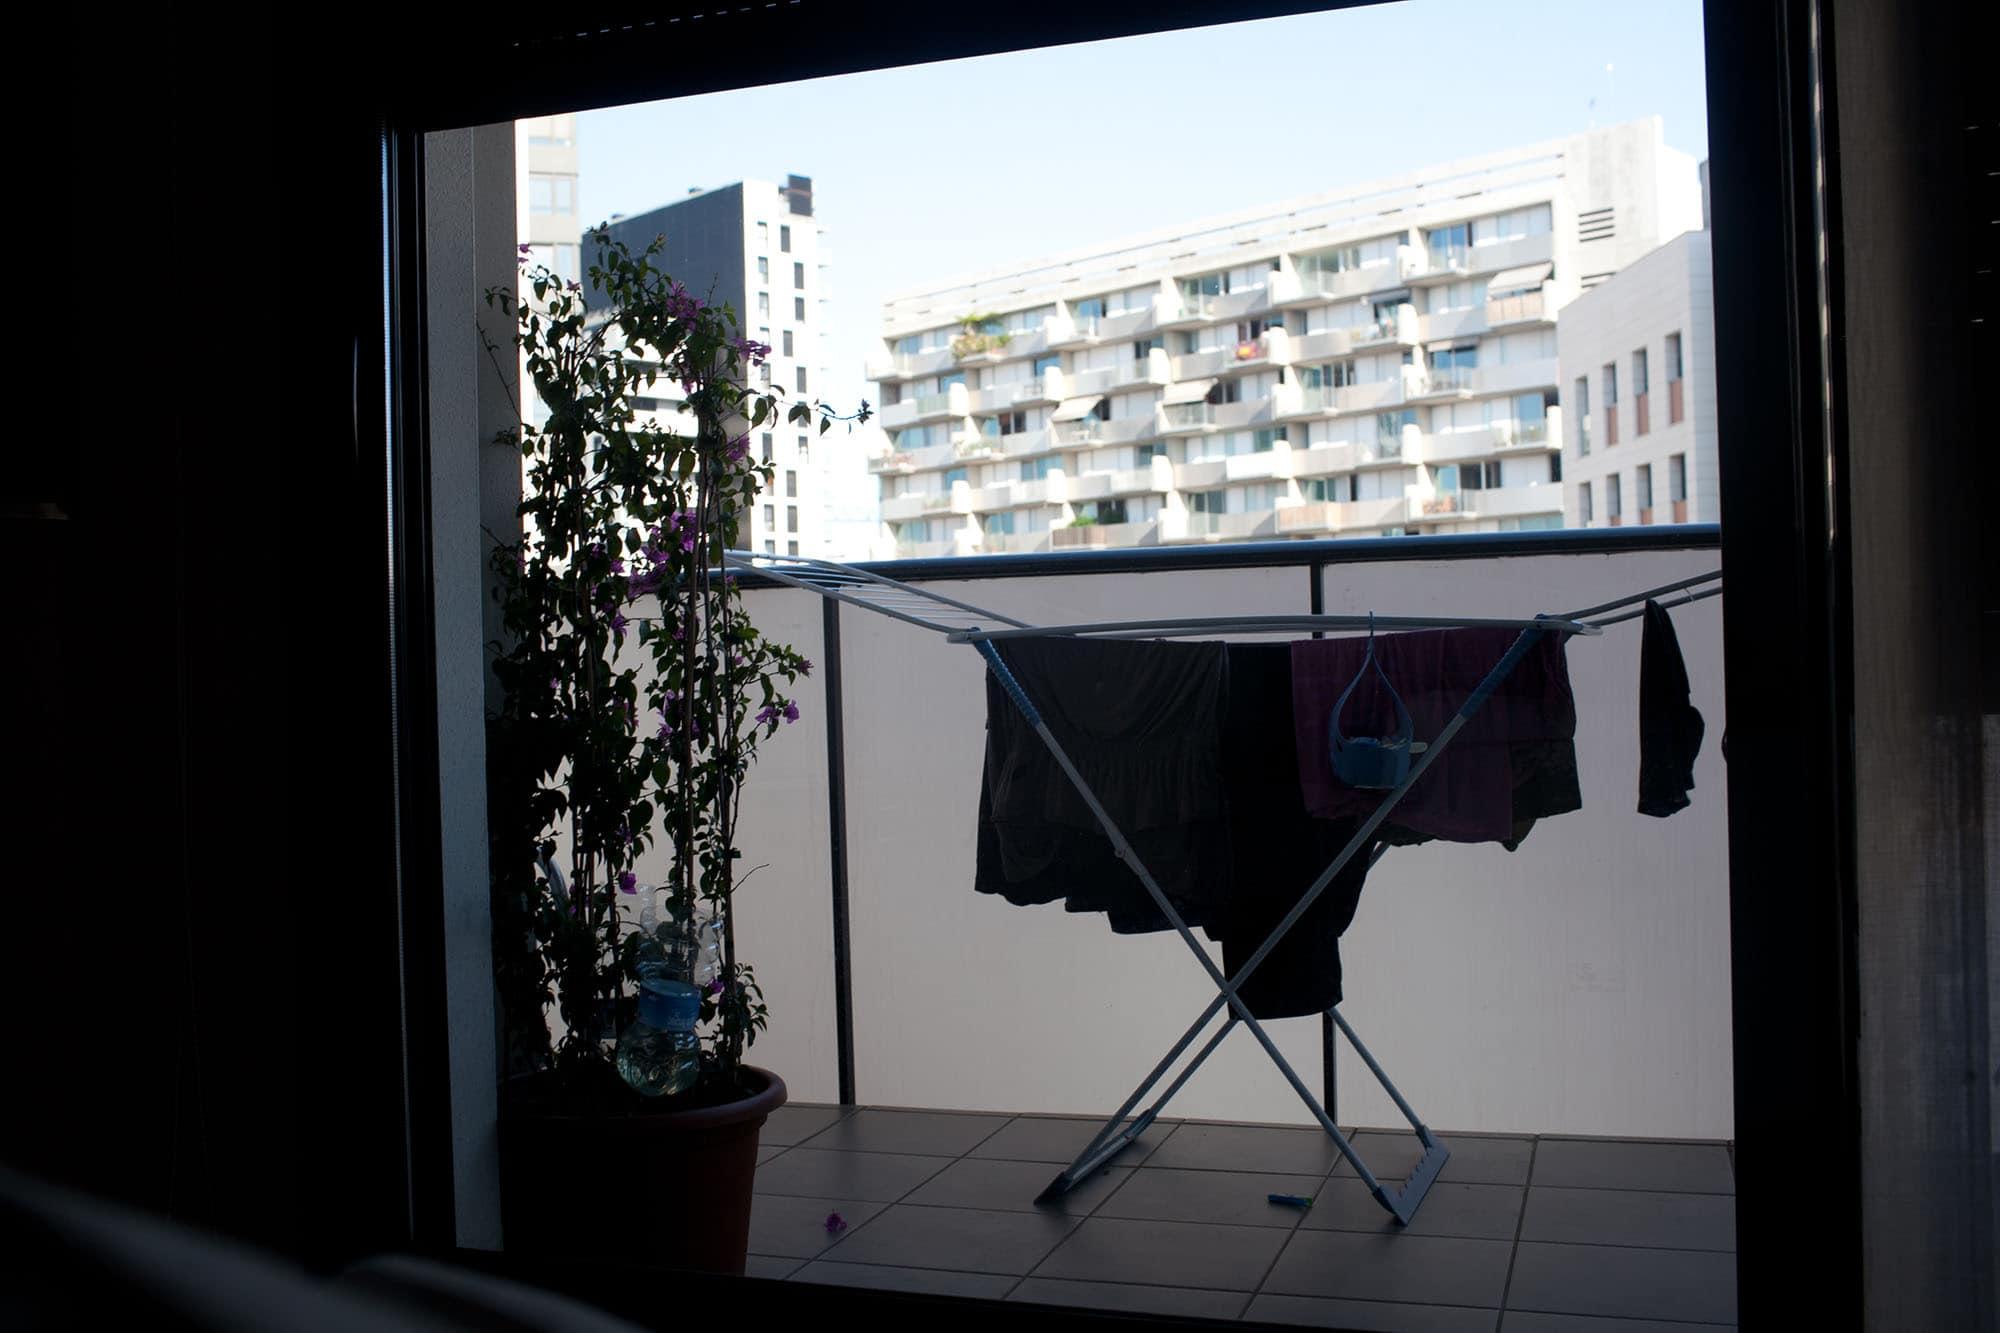 Doing my laundry in Barcelona, Spain